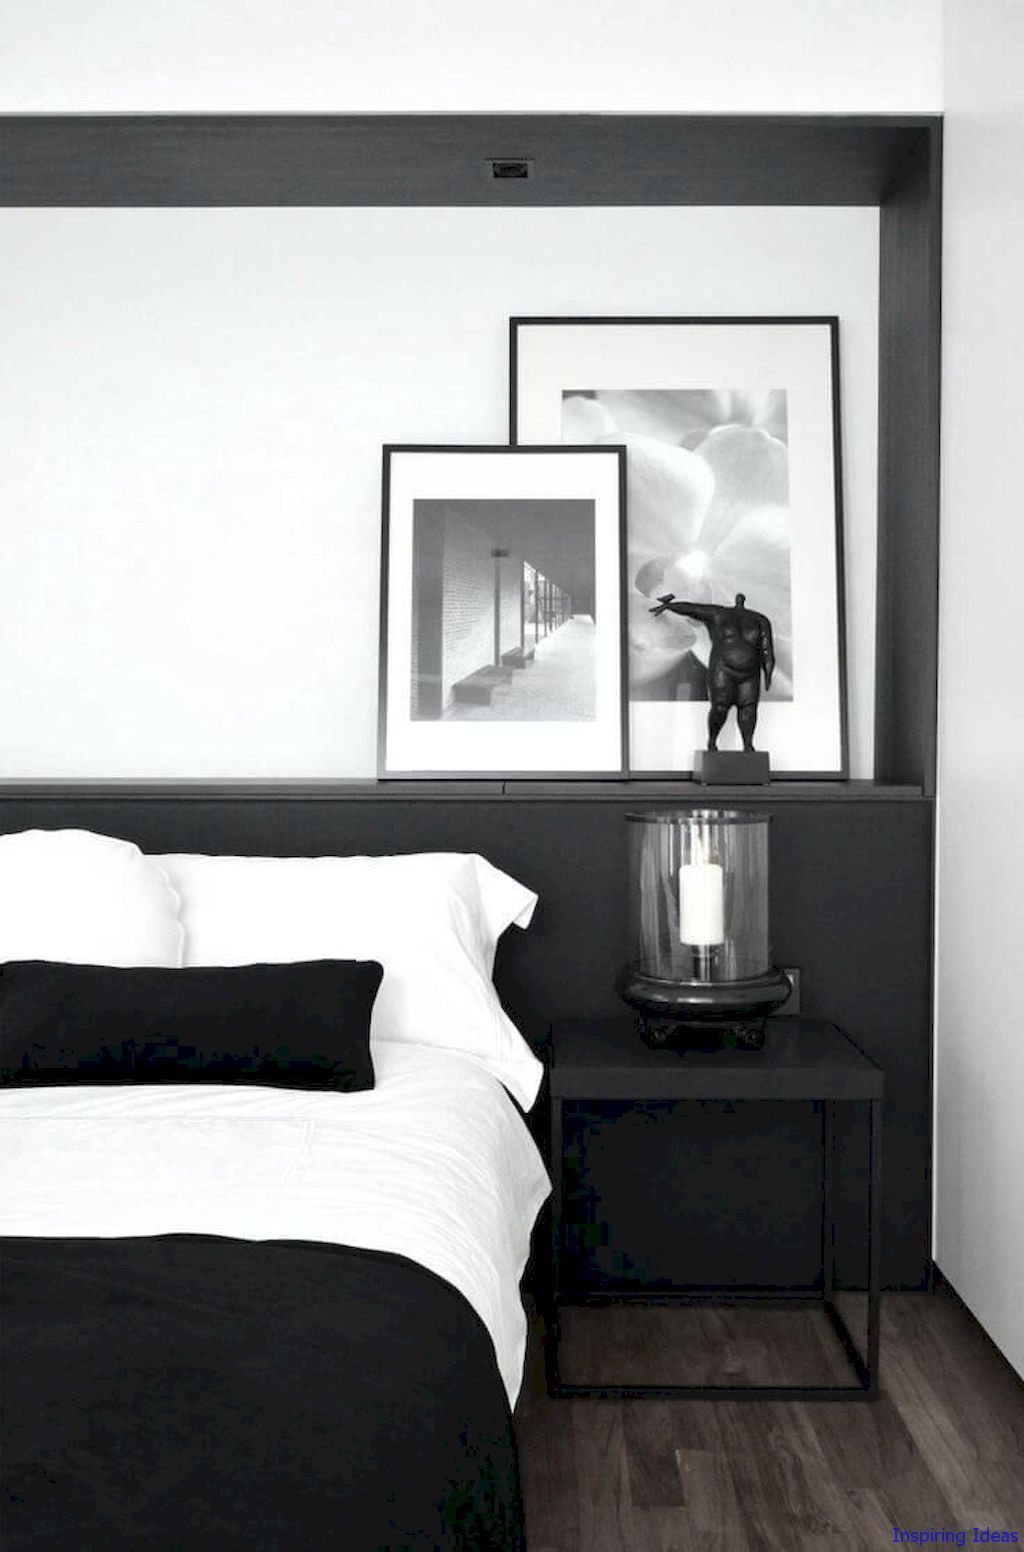 77 Masculine Apartment Decorating Ideas for Men